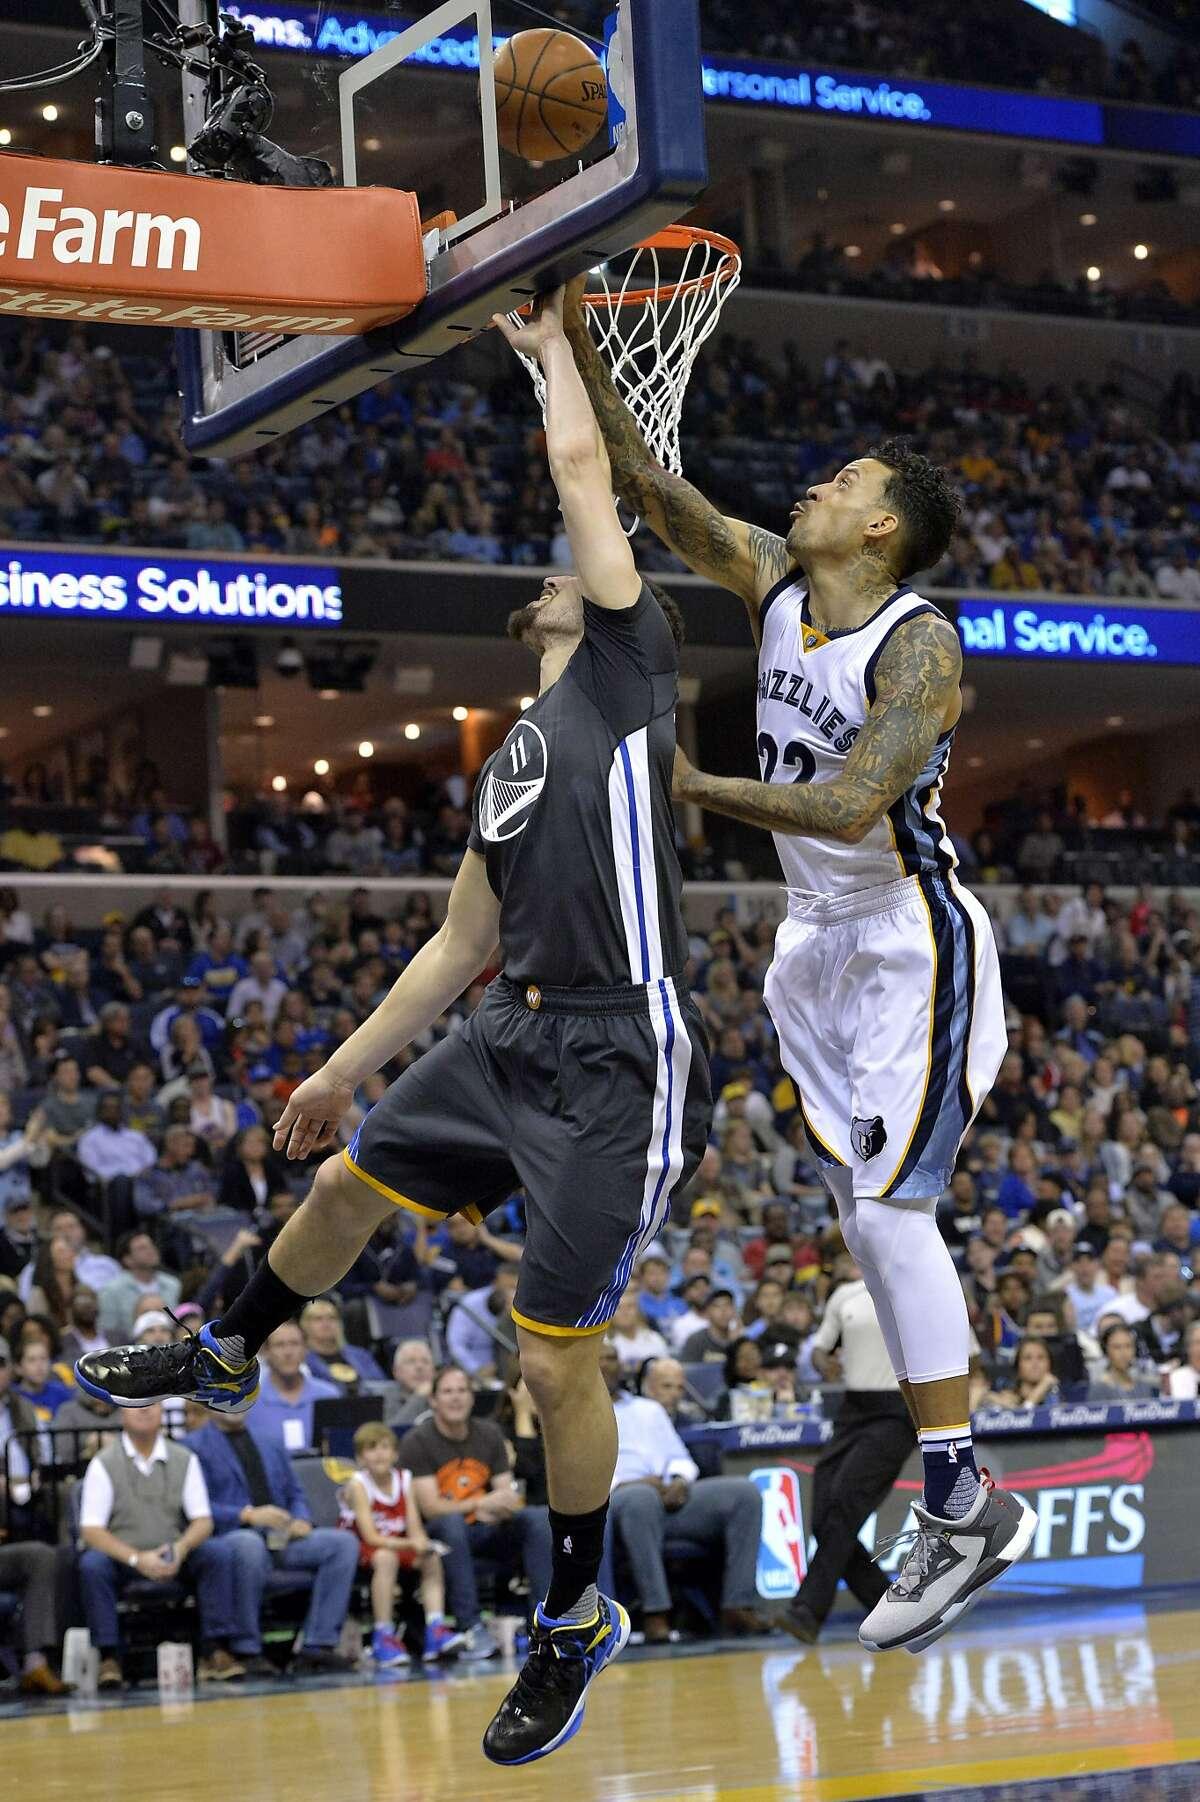 Golden State Warriors guard Klay Thompson (11) shoots against Memphis Grizzlies forward Matt Barnes (22) in the first half of an NBA basketball game Saturday, April 9, 2016, in Memphis, Tenn. (AP Photo/Brandon Dill)